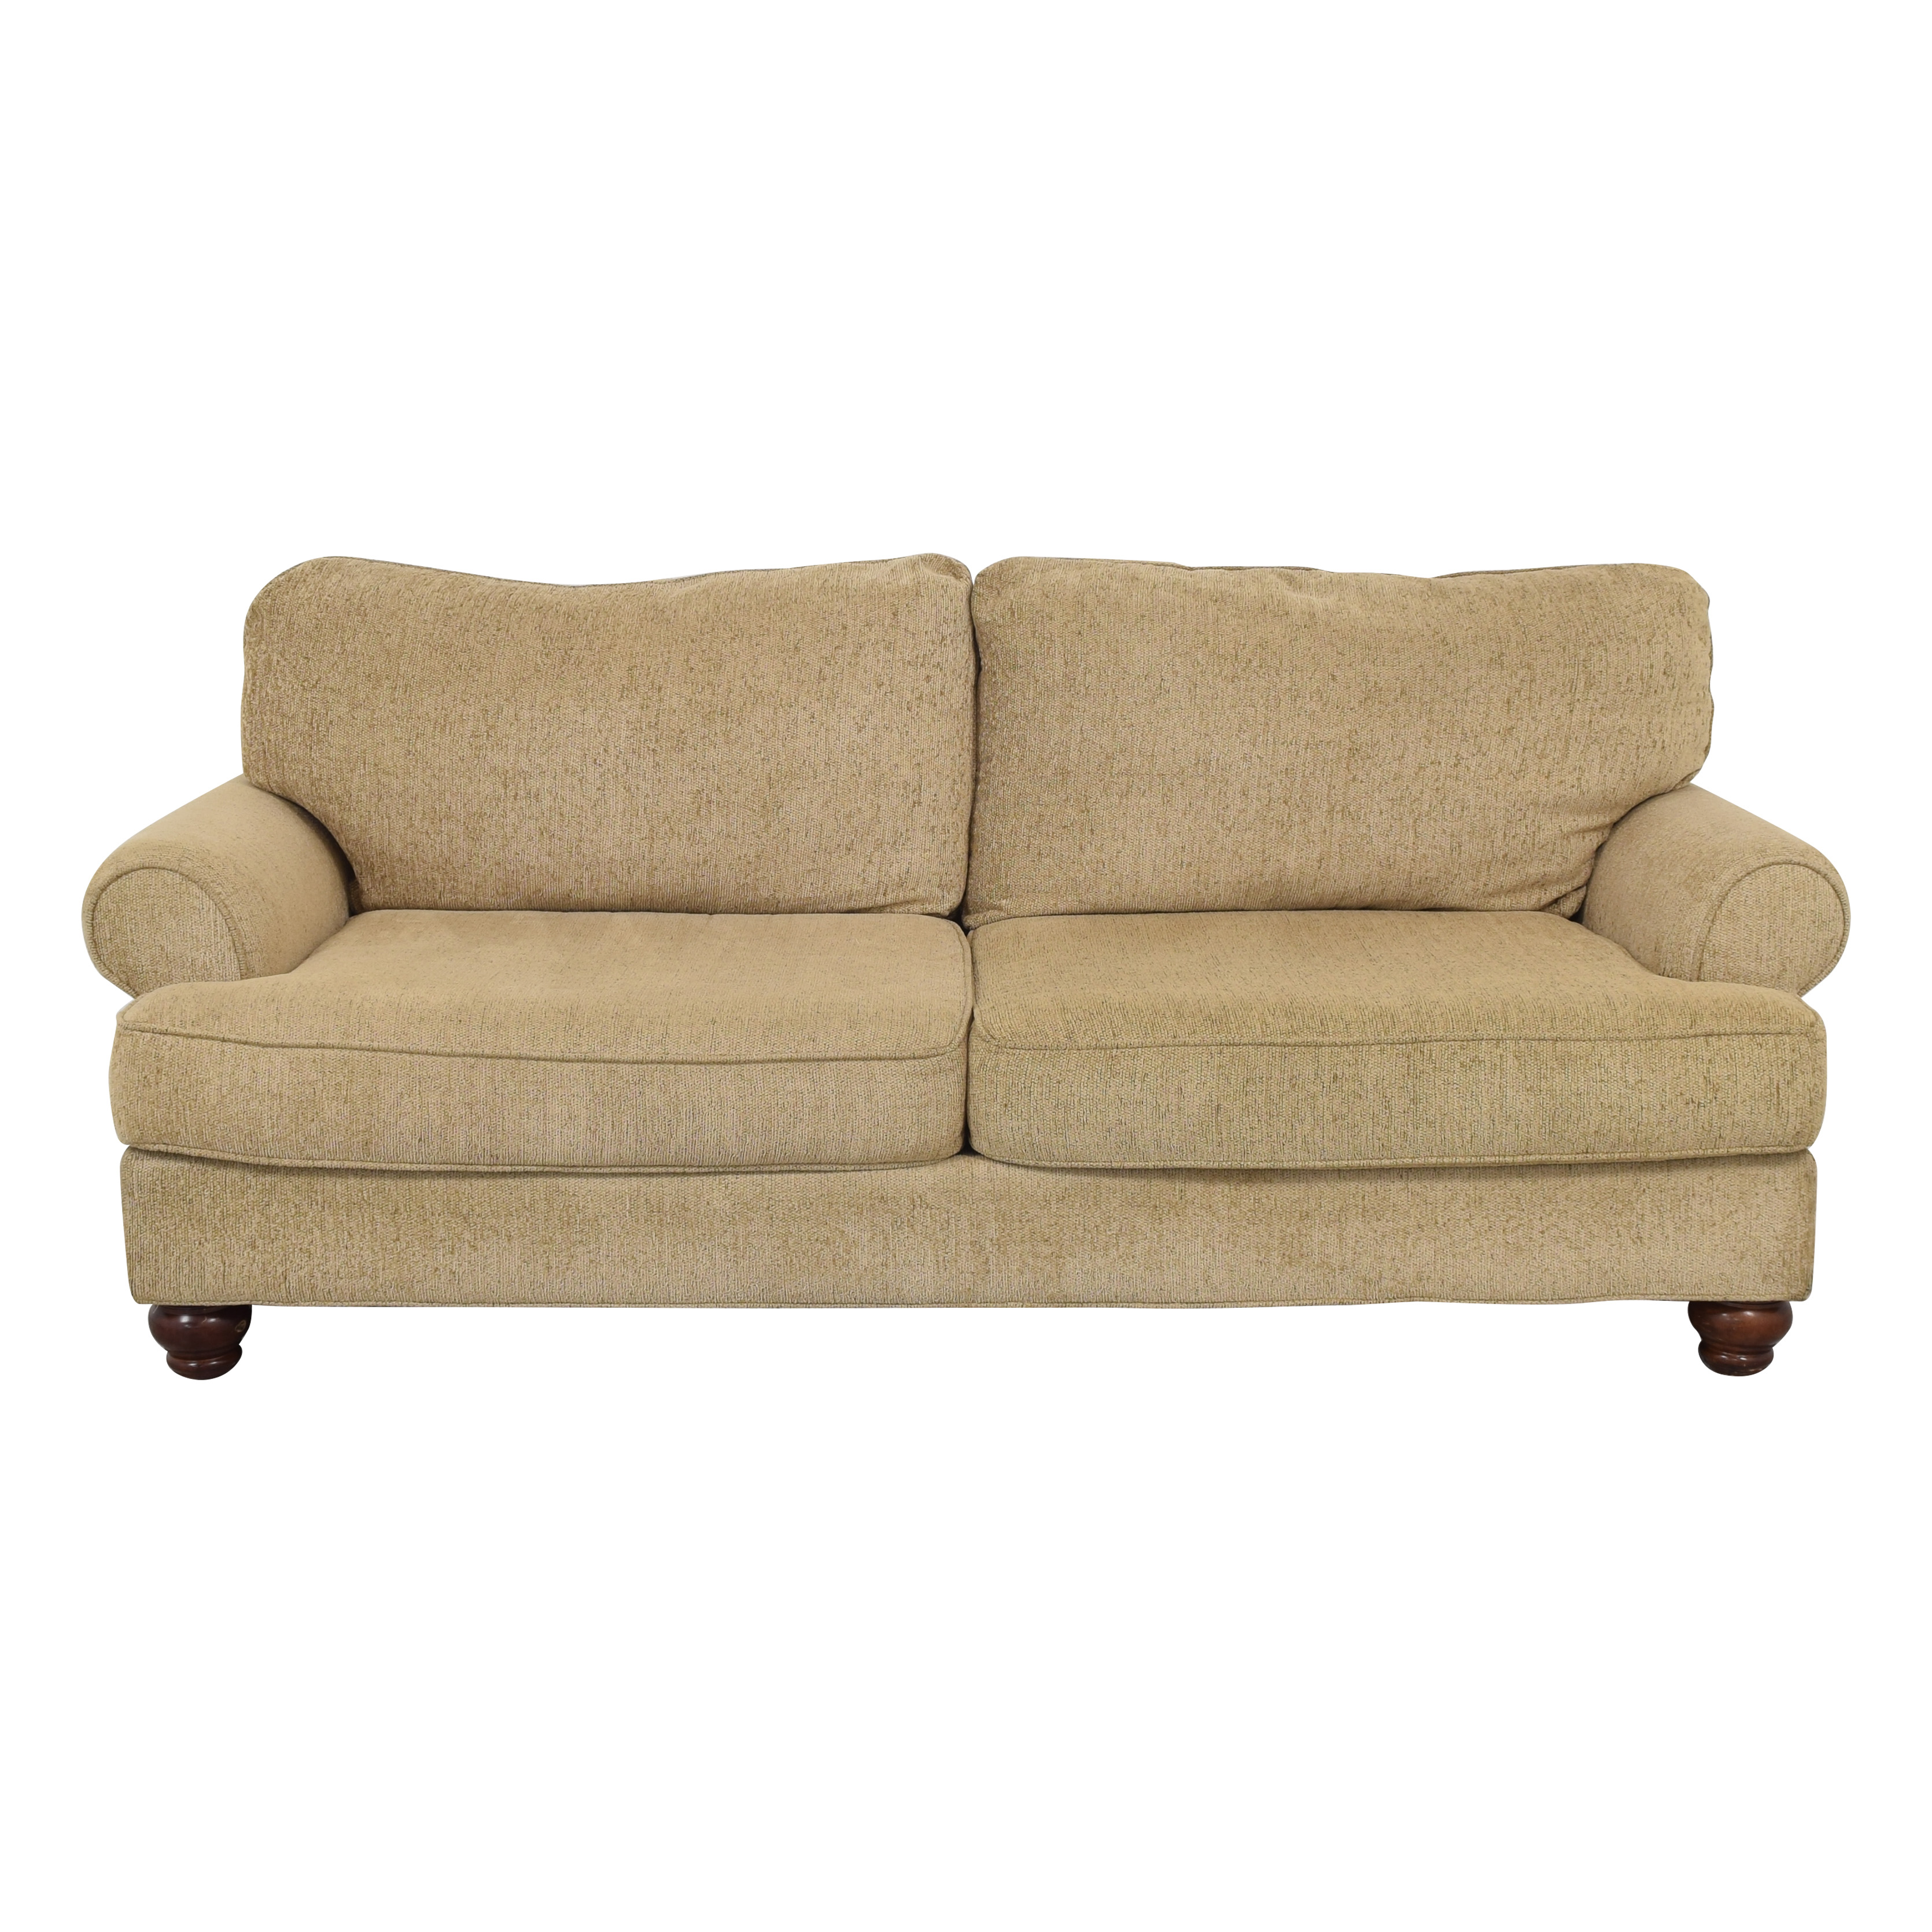 Raymour & Flanigan Raymour & Flanigan Beige Sofa Sofas